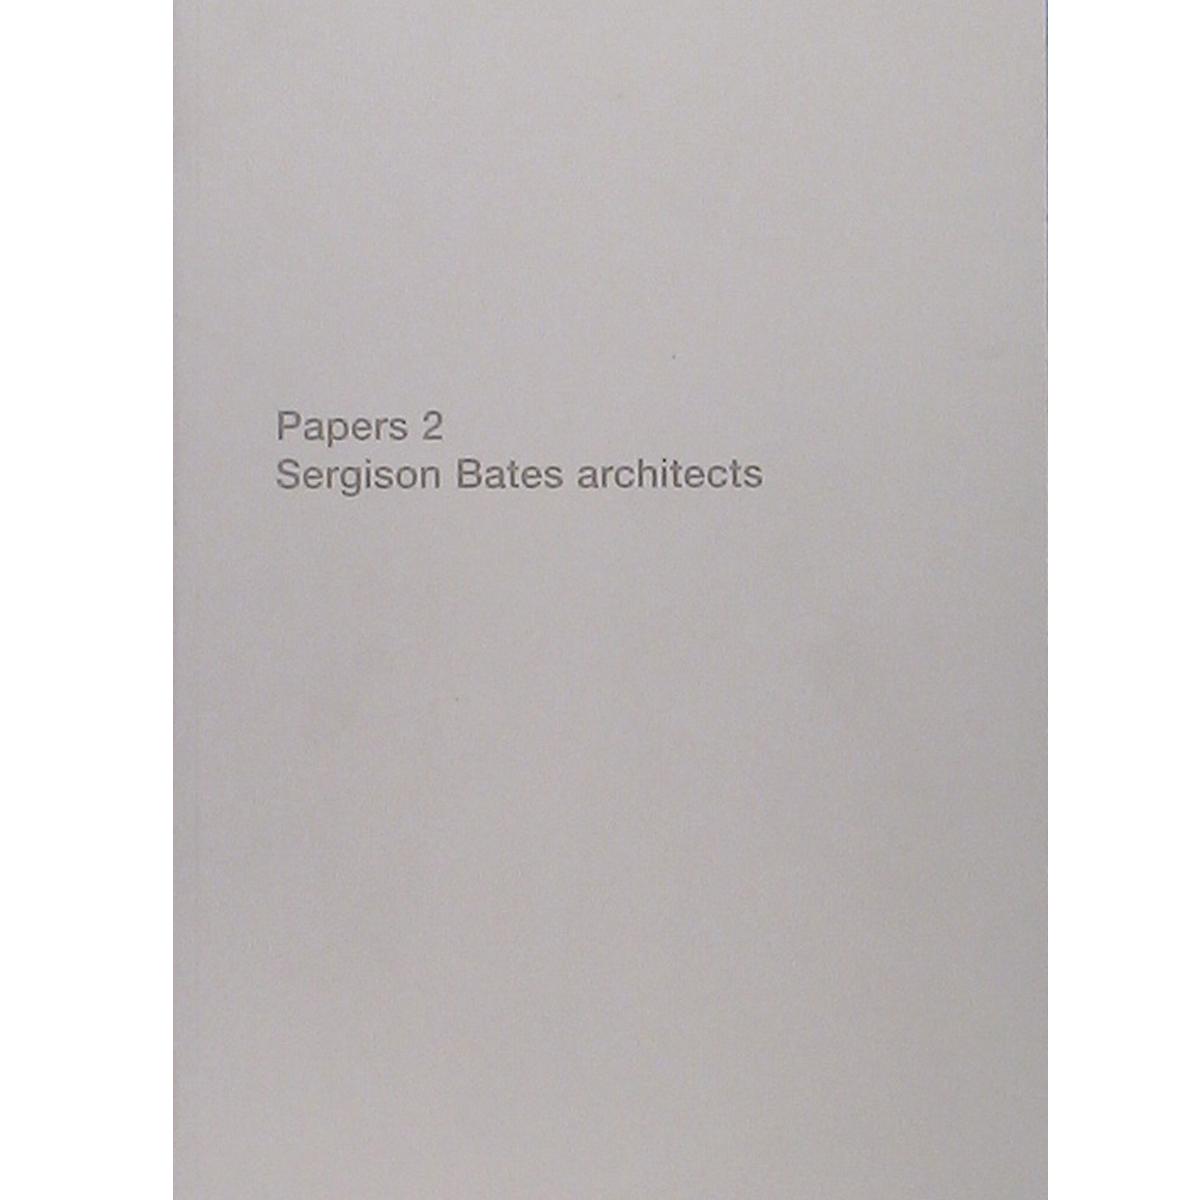 Papers 2. Sergison Bates Architects